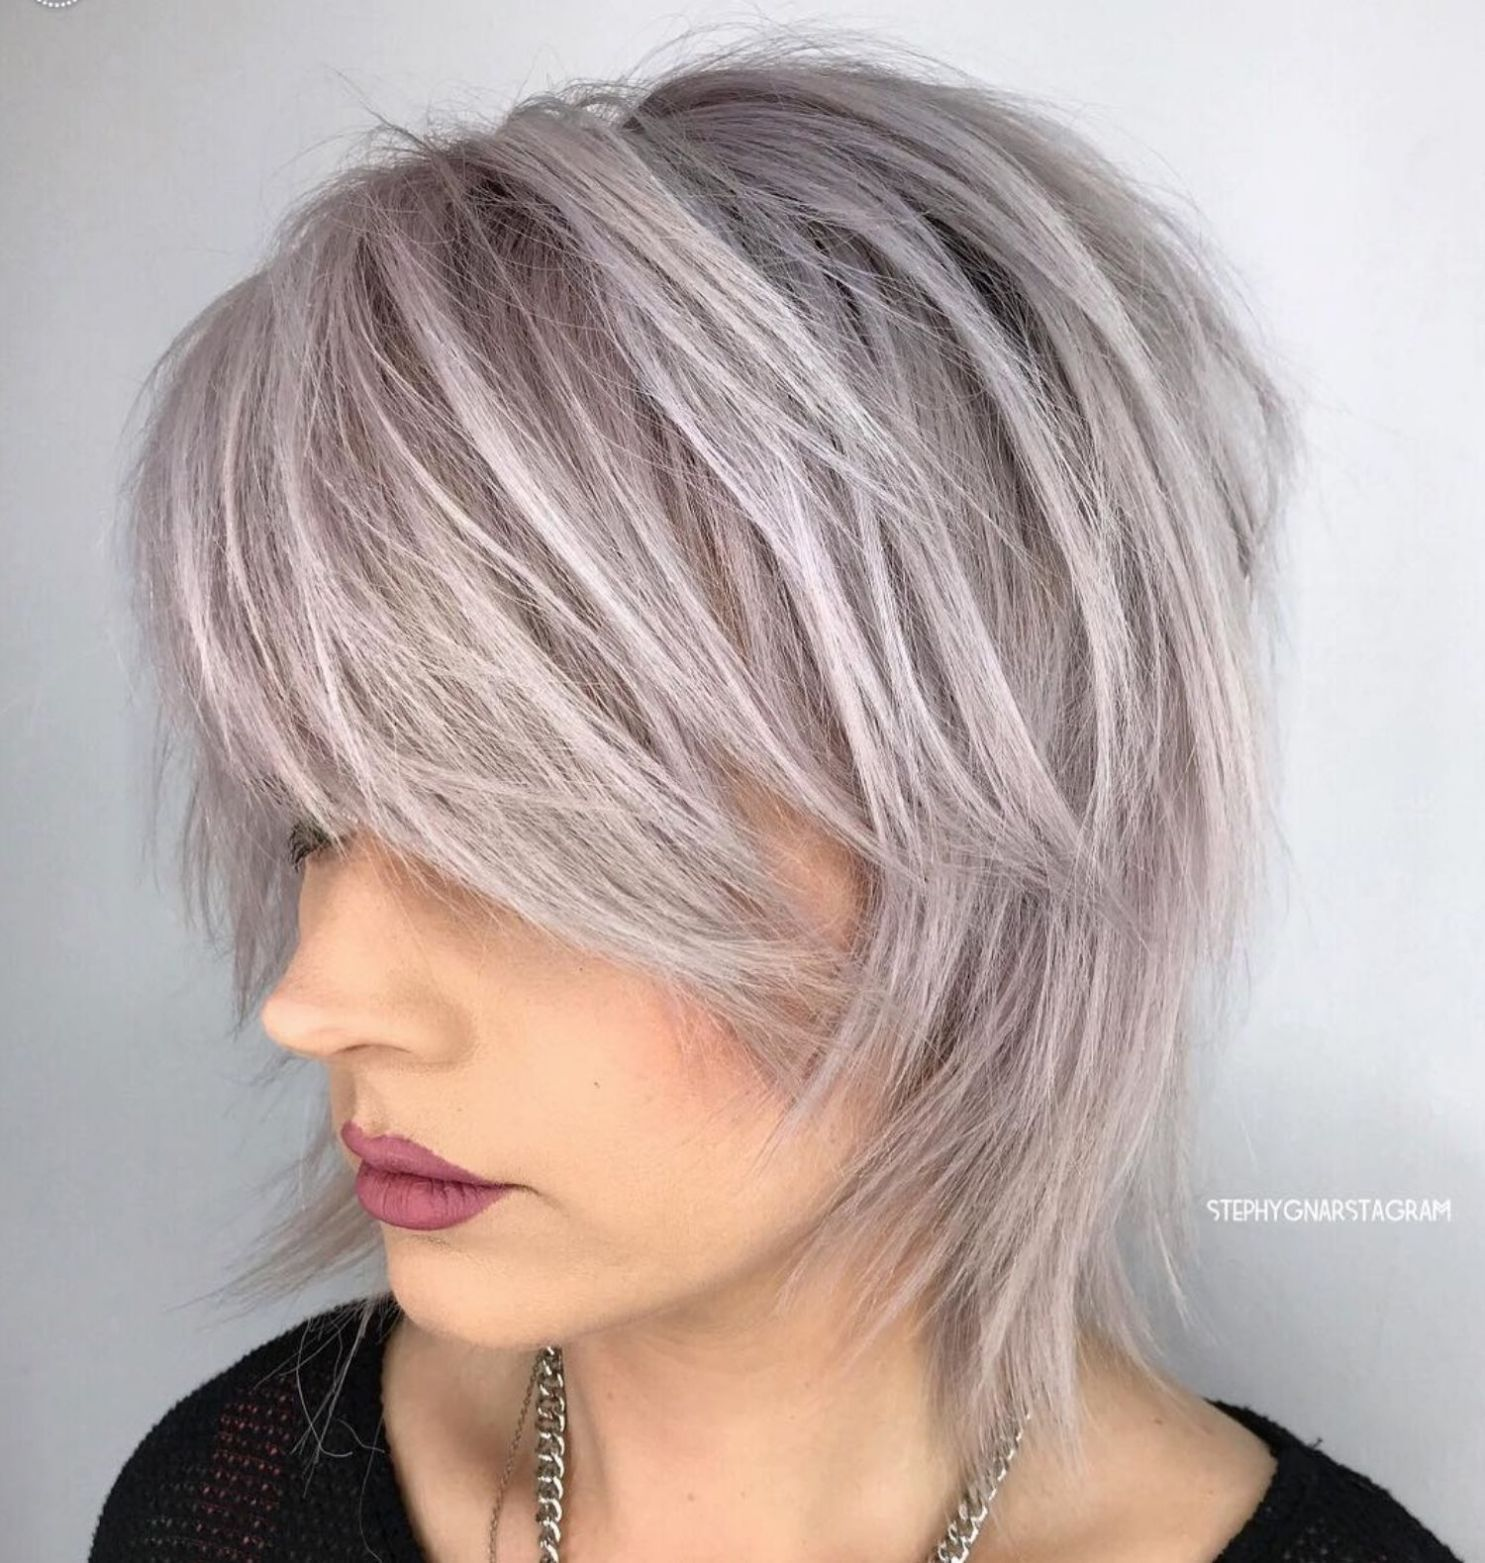 60 Most Universal Modern Shag Haircut Solutions Modern Shag Haircut Thin Hair Haircuts Long Shag Haircut